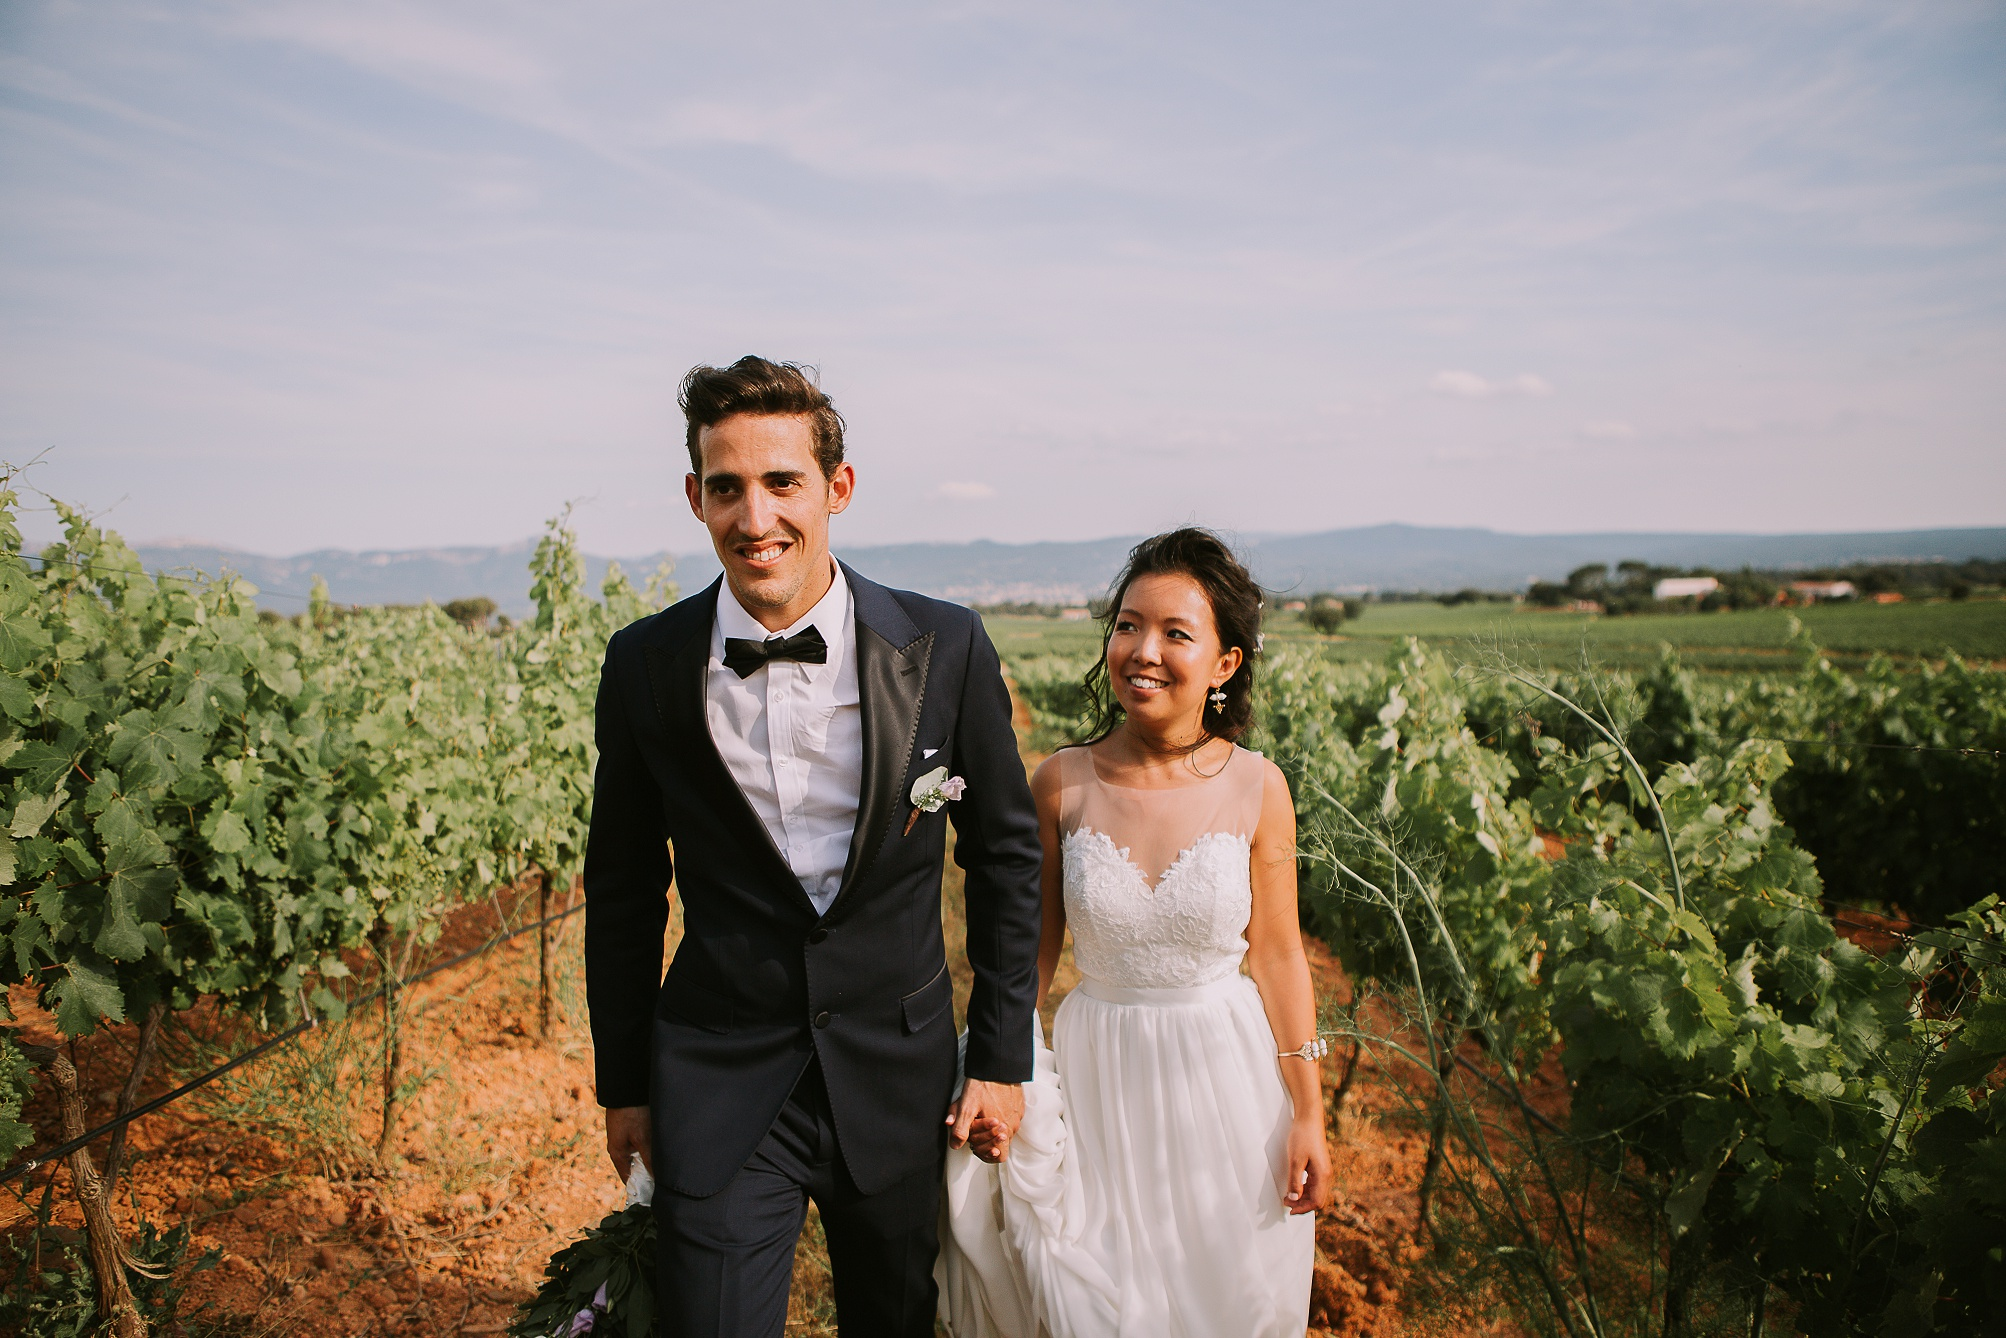 katerynaphotos-mariage-photographe-puyloubier-provence-aix-en-provence-sud-de-la-france_0404.jpg